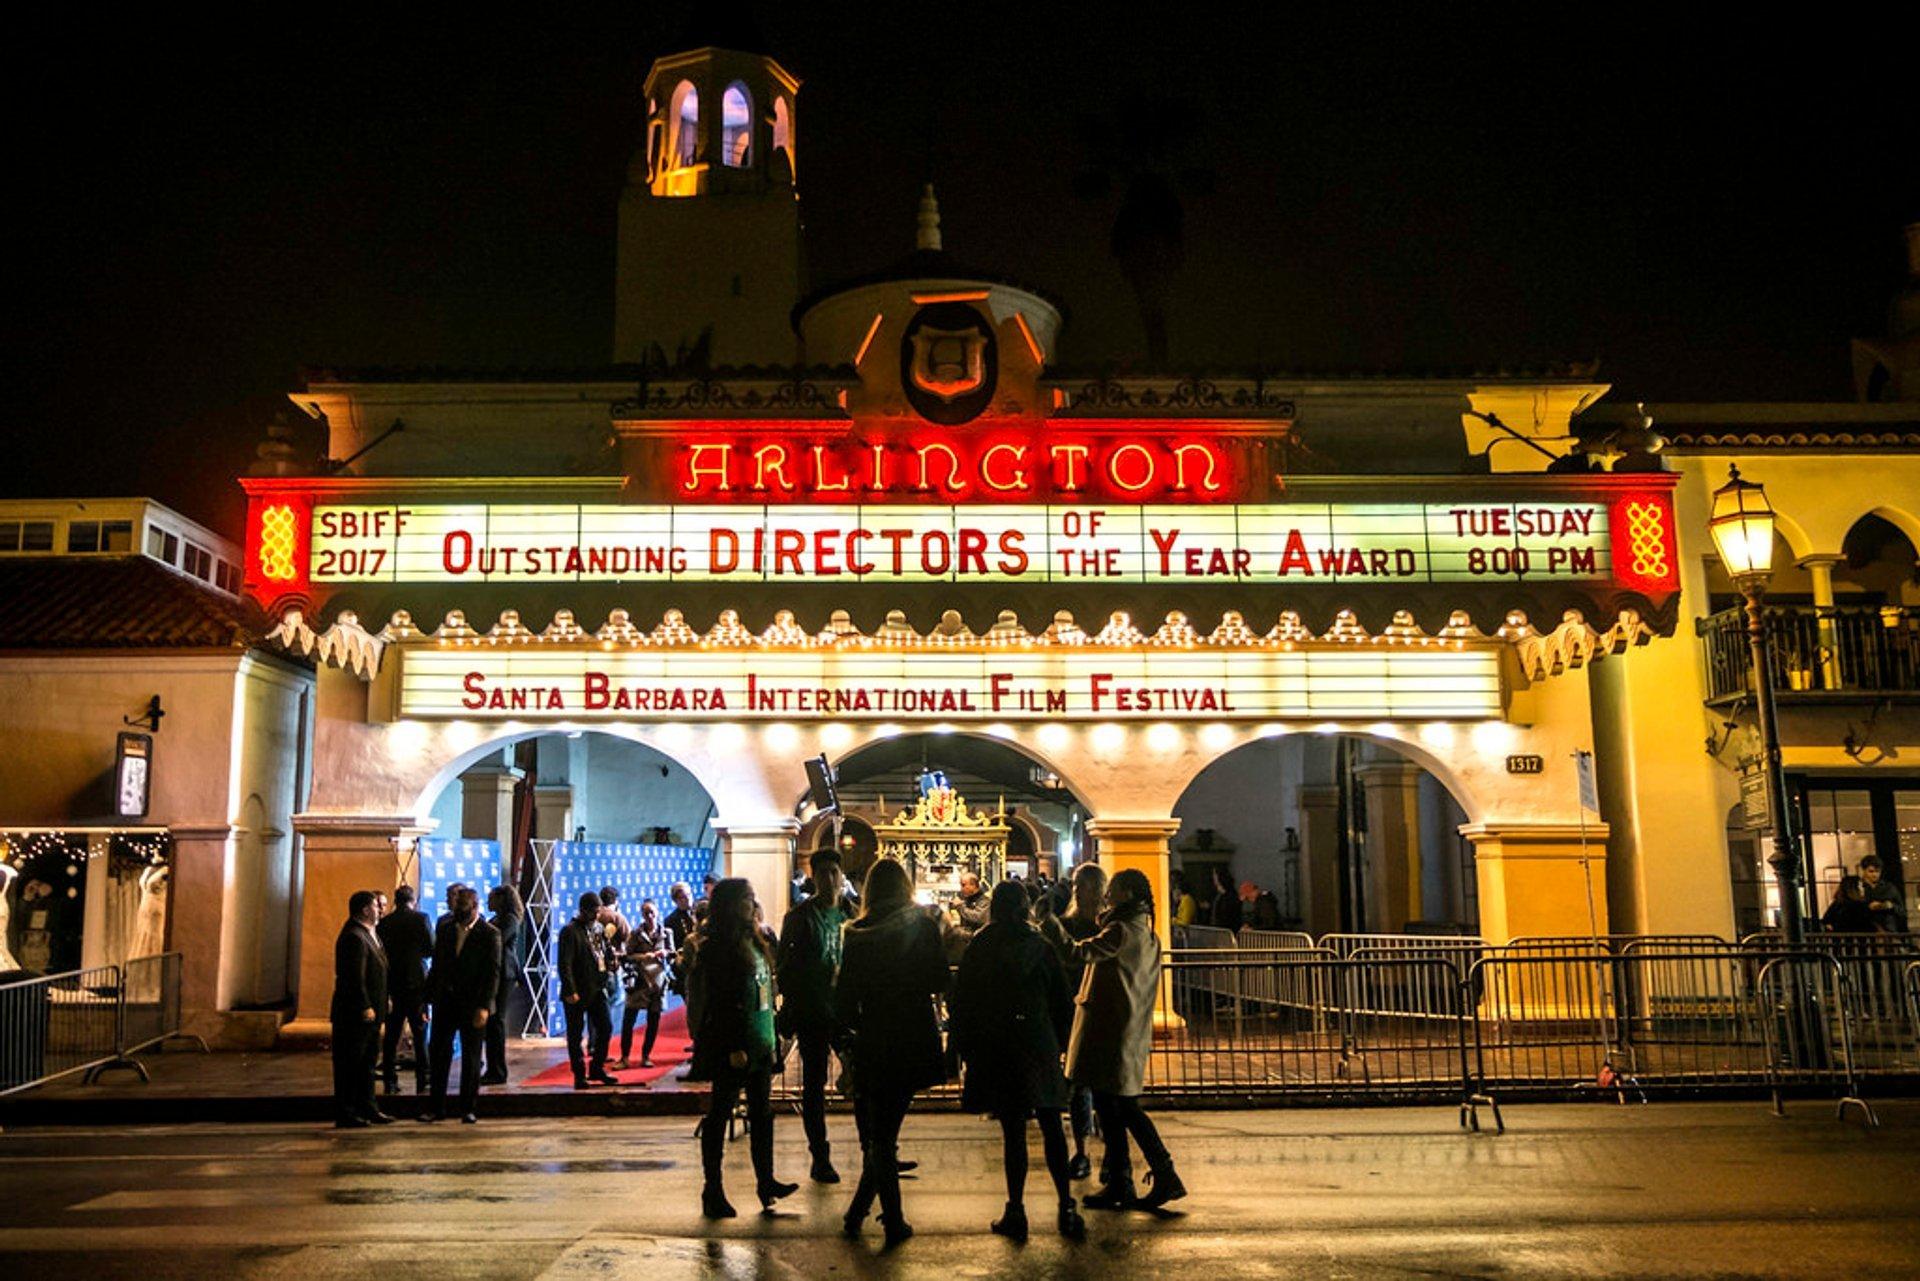 Santa Barbara International Film Festival (SBIFF) in California 2020 - Best Time